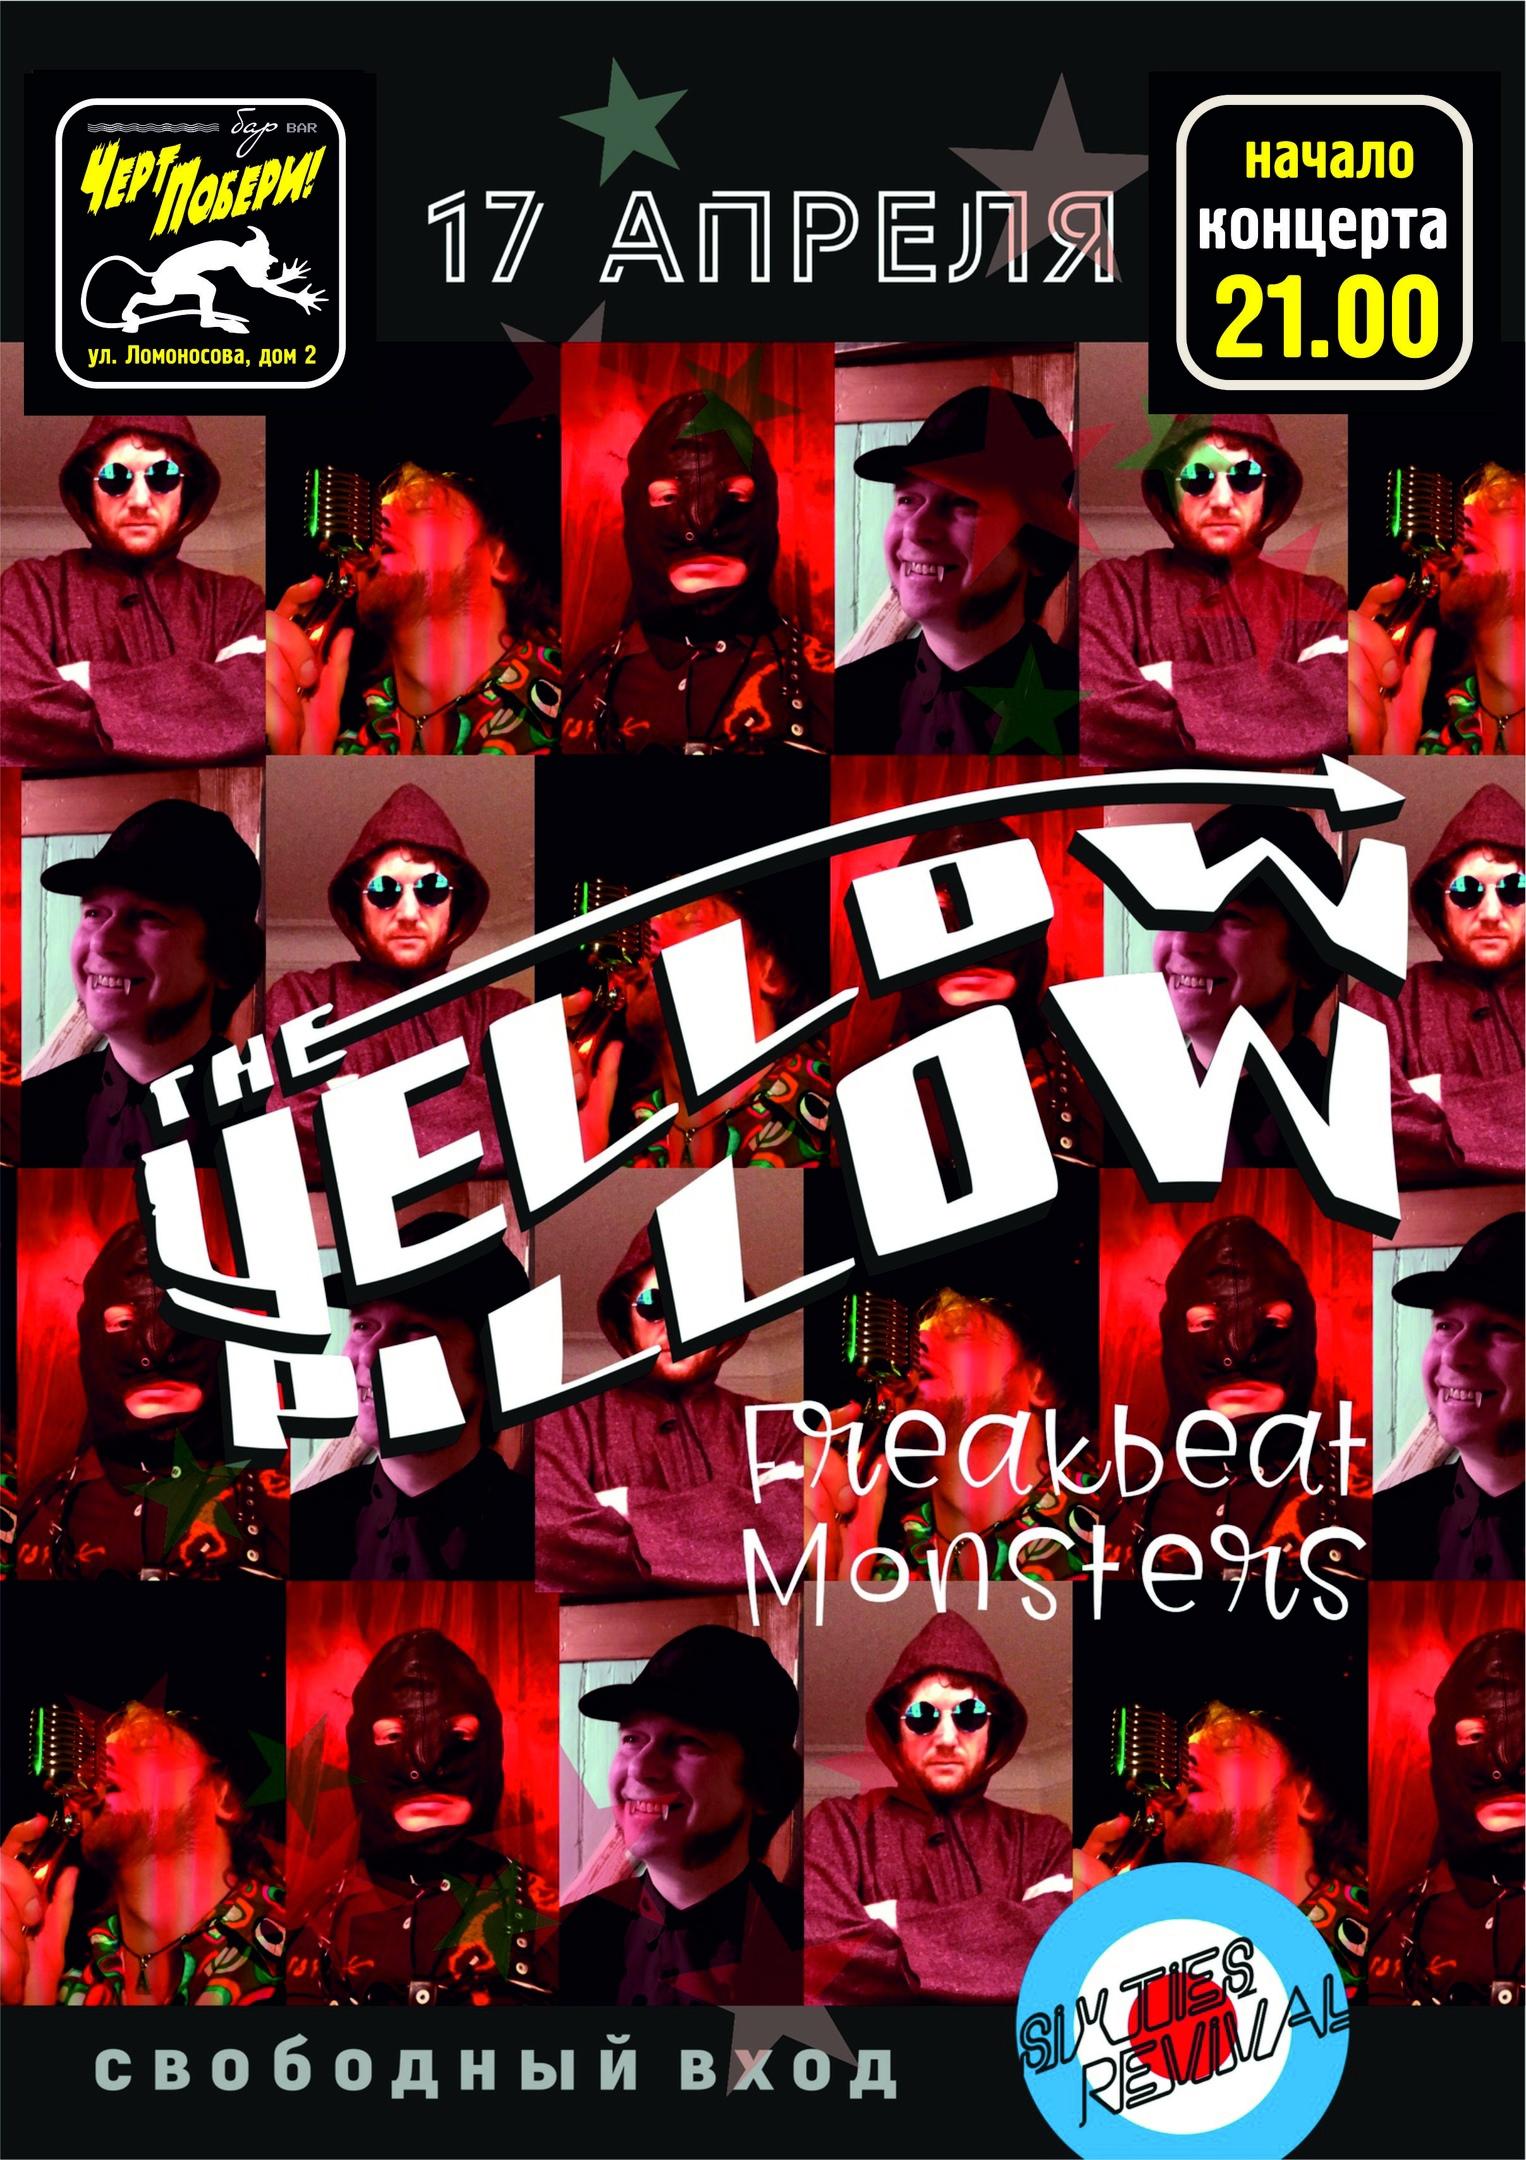 17.04 The Yellow Pillow в ЧП!